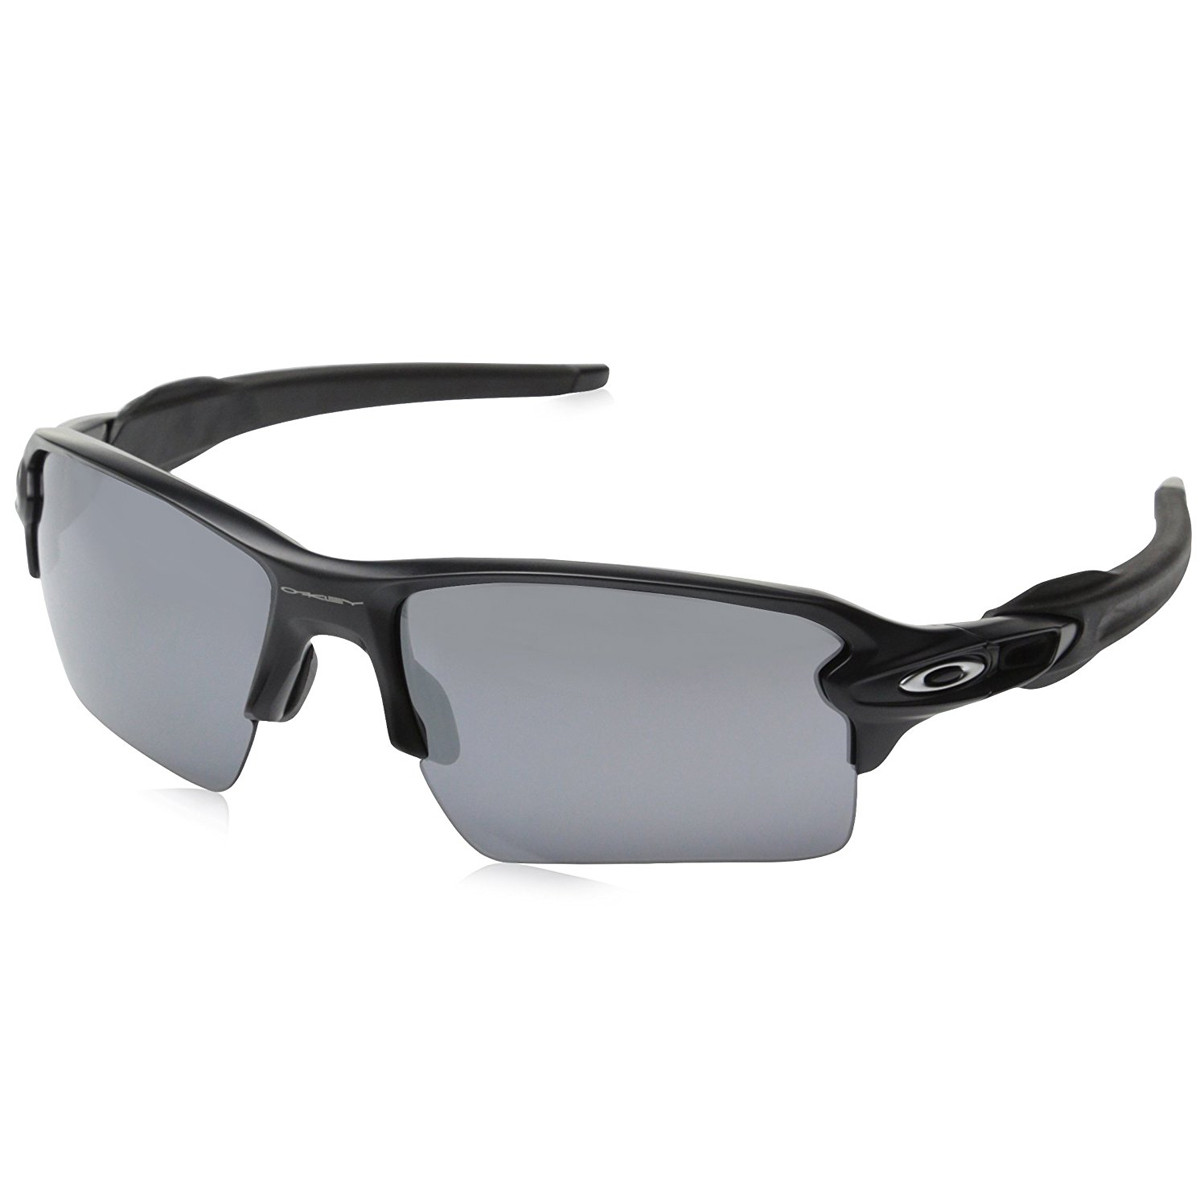 Óculos Oakley Flak 2.0 XL Matte Black Black Iridium LANÇAMENTO ref ... 738b0b14af